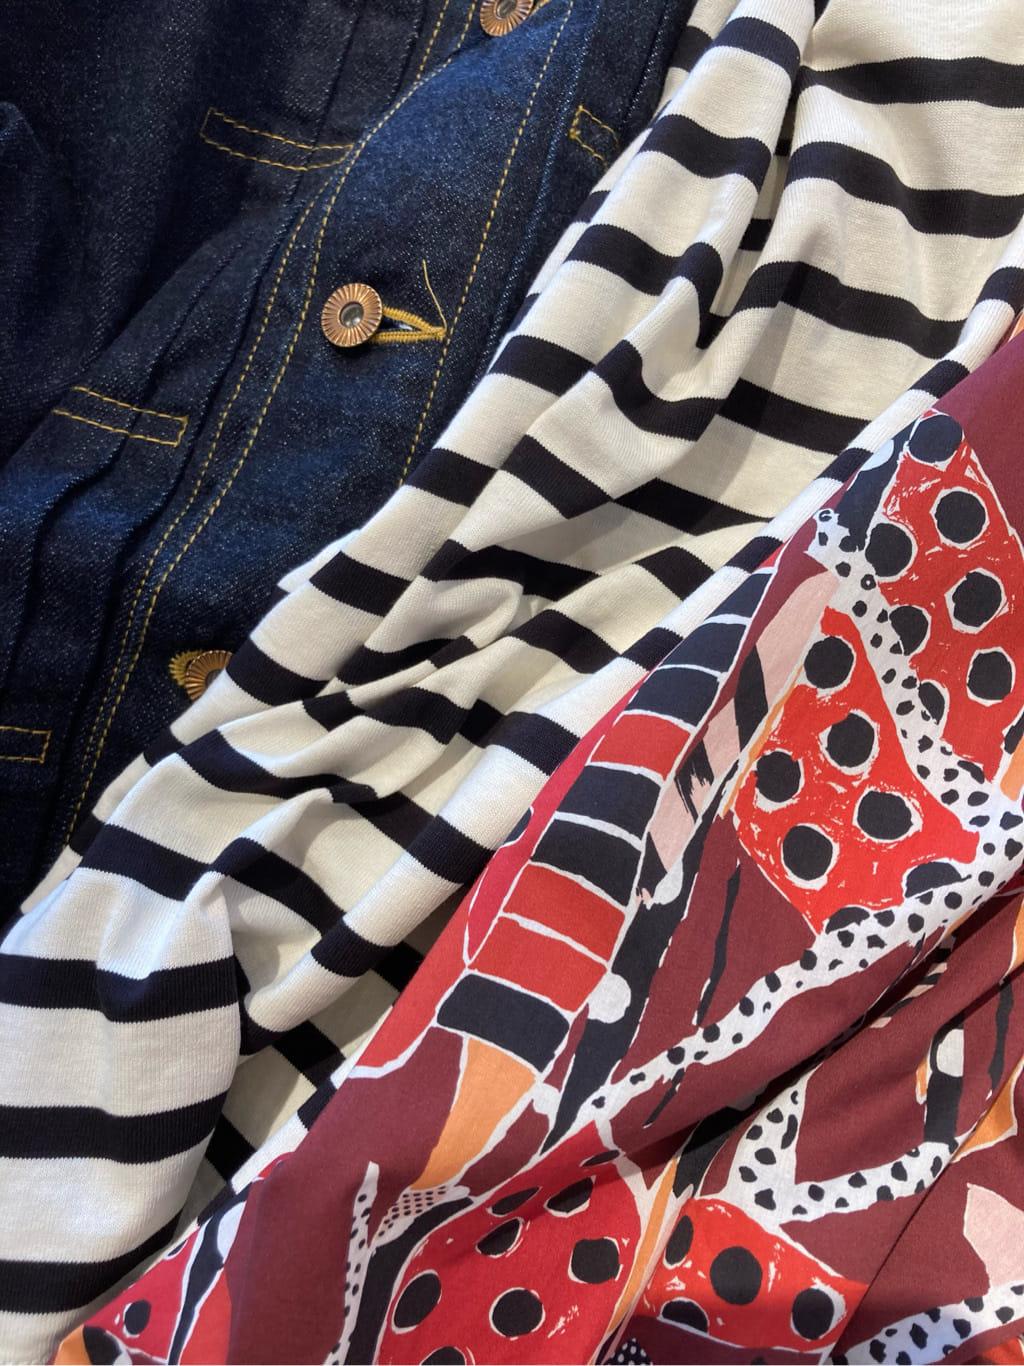 Dot and Stripes CHILD WOMAN 名古屋栄路面 身長:161cm 2021.08.07